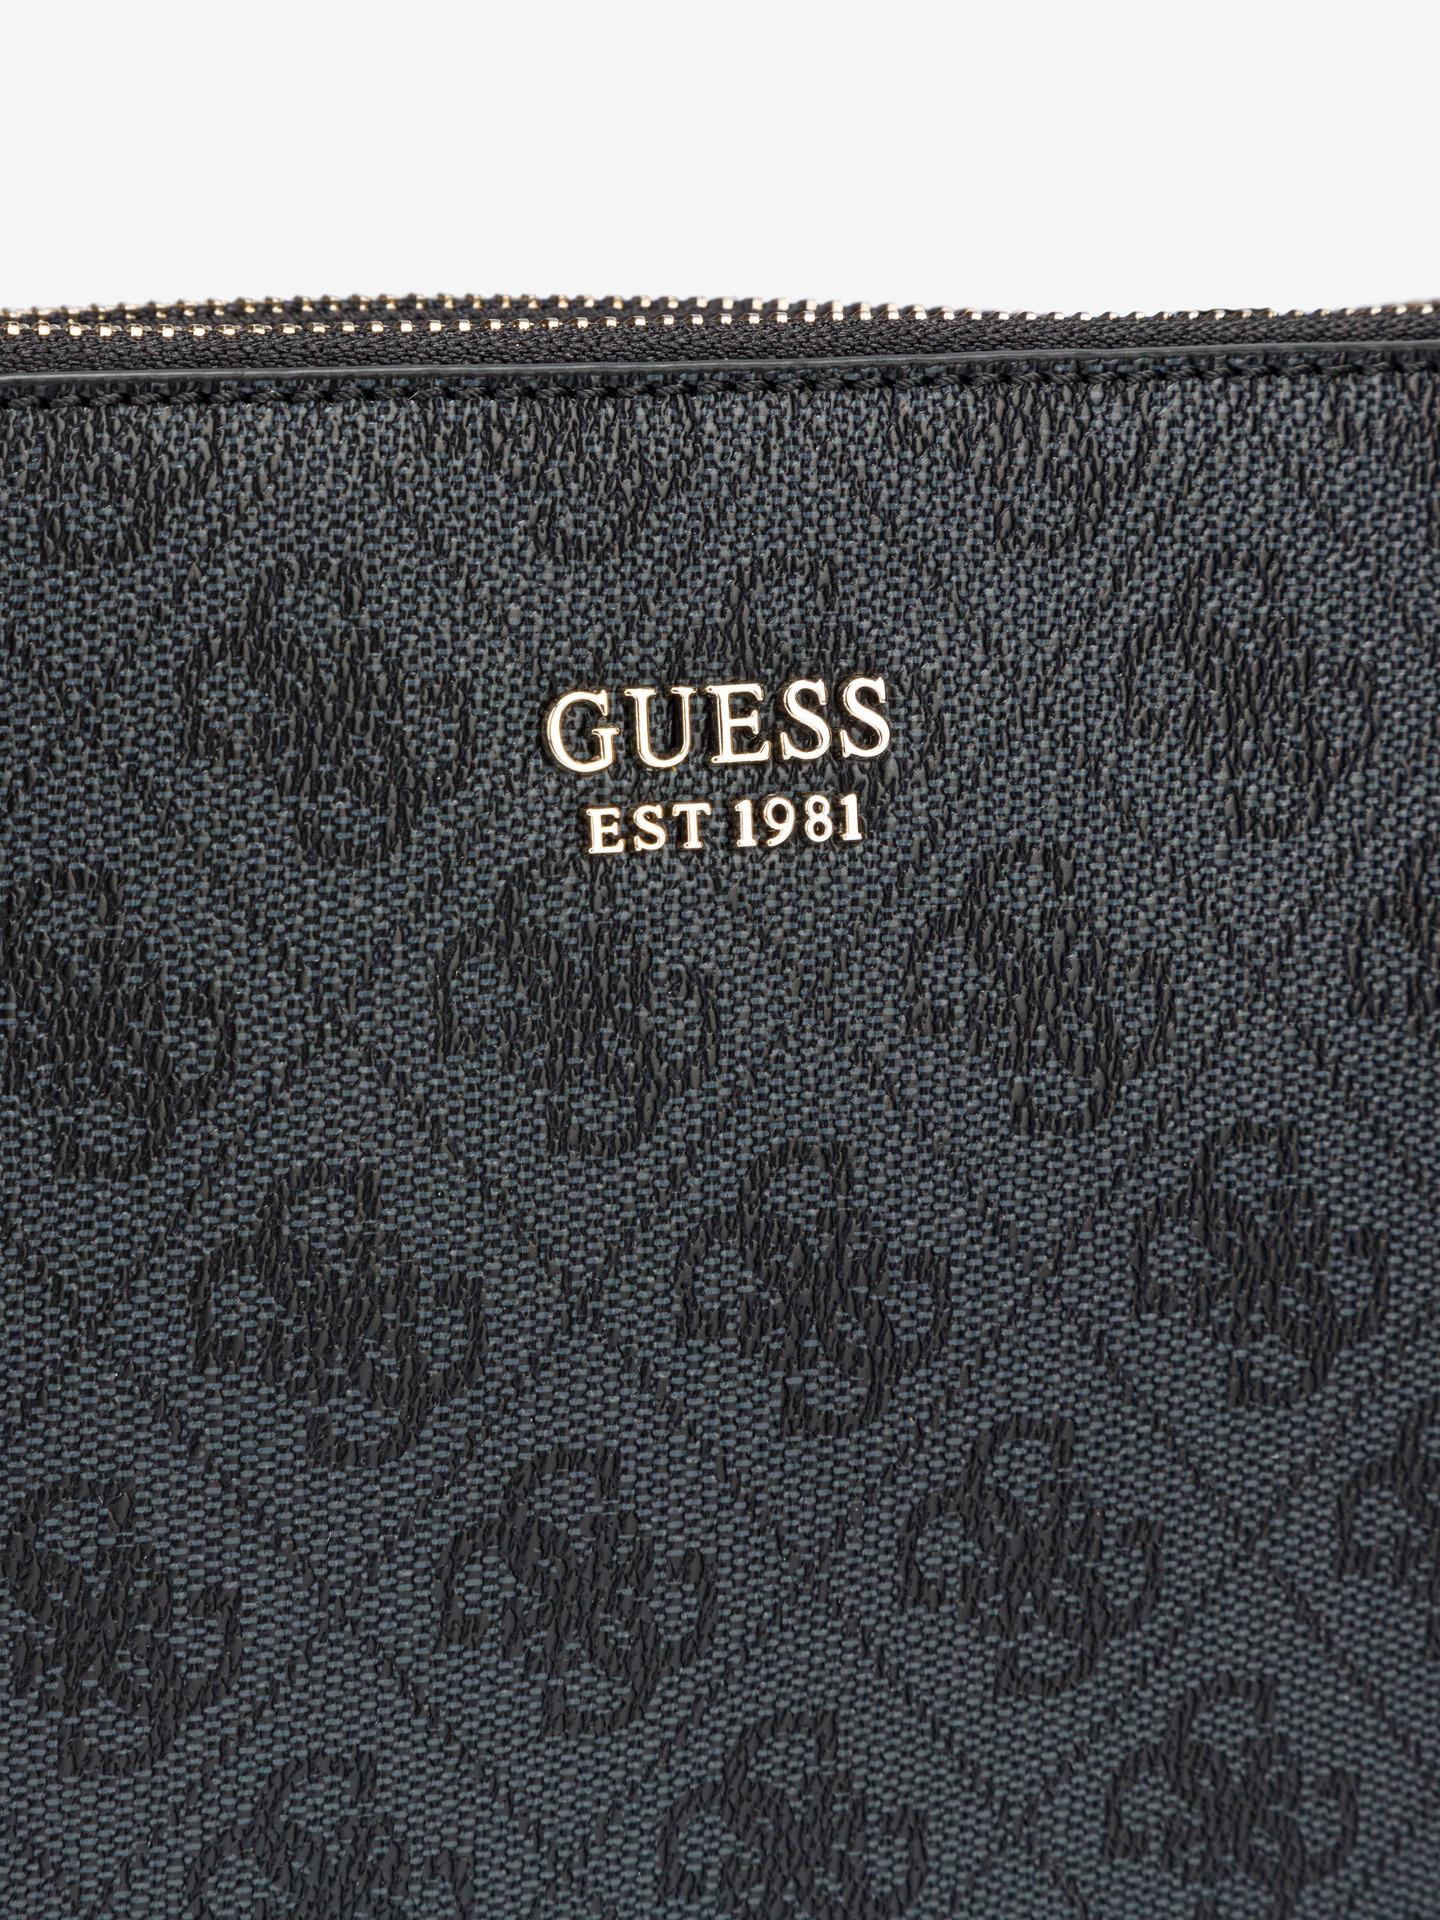 Guess grey crossbody handbag Naya